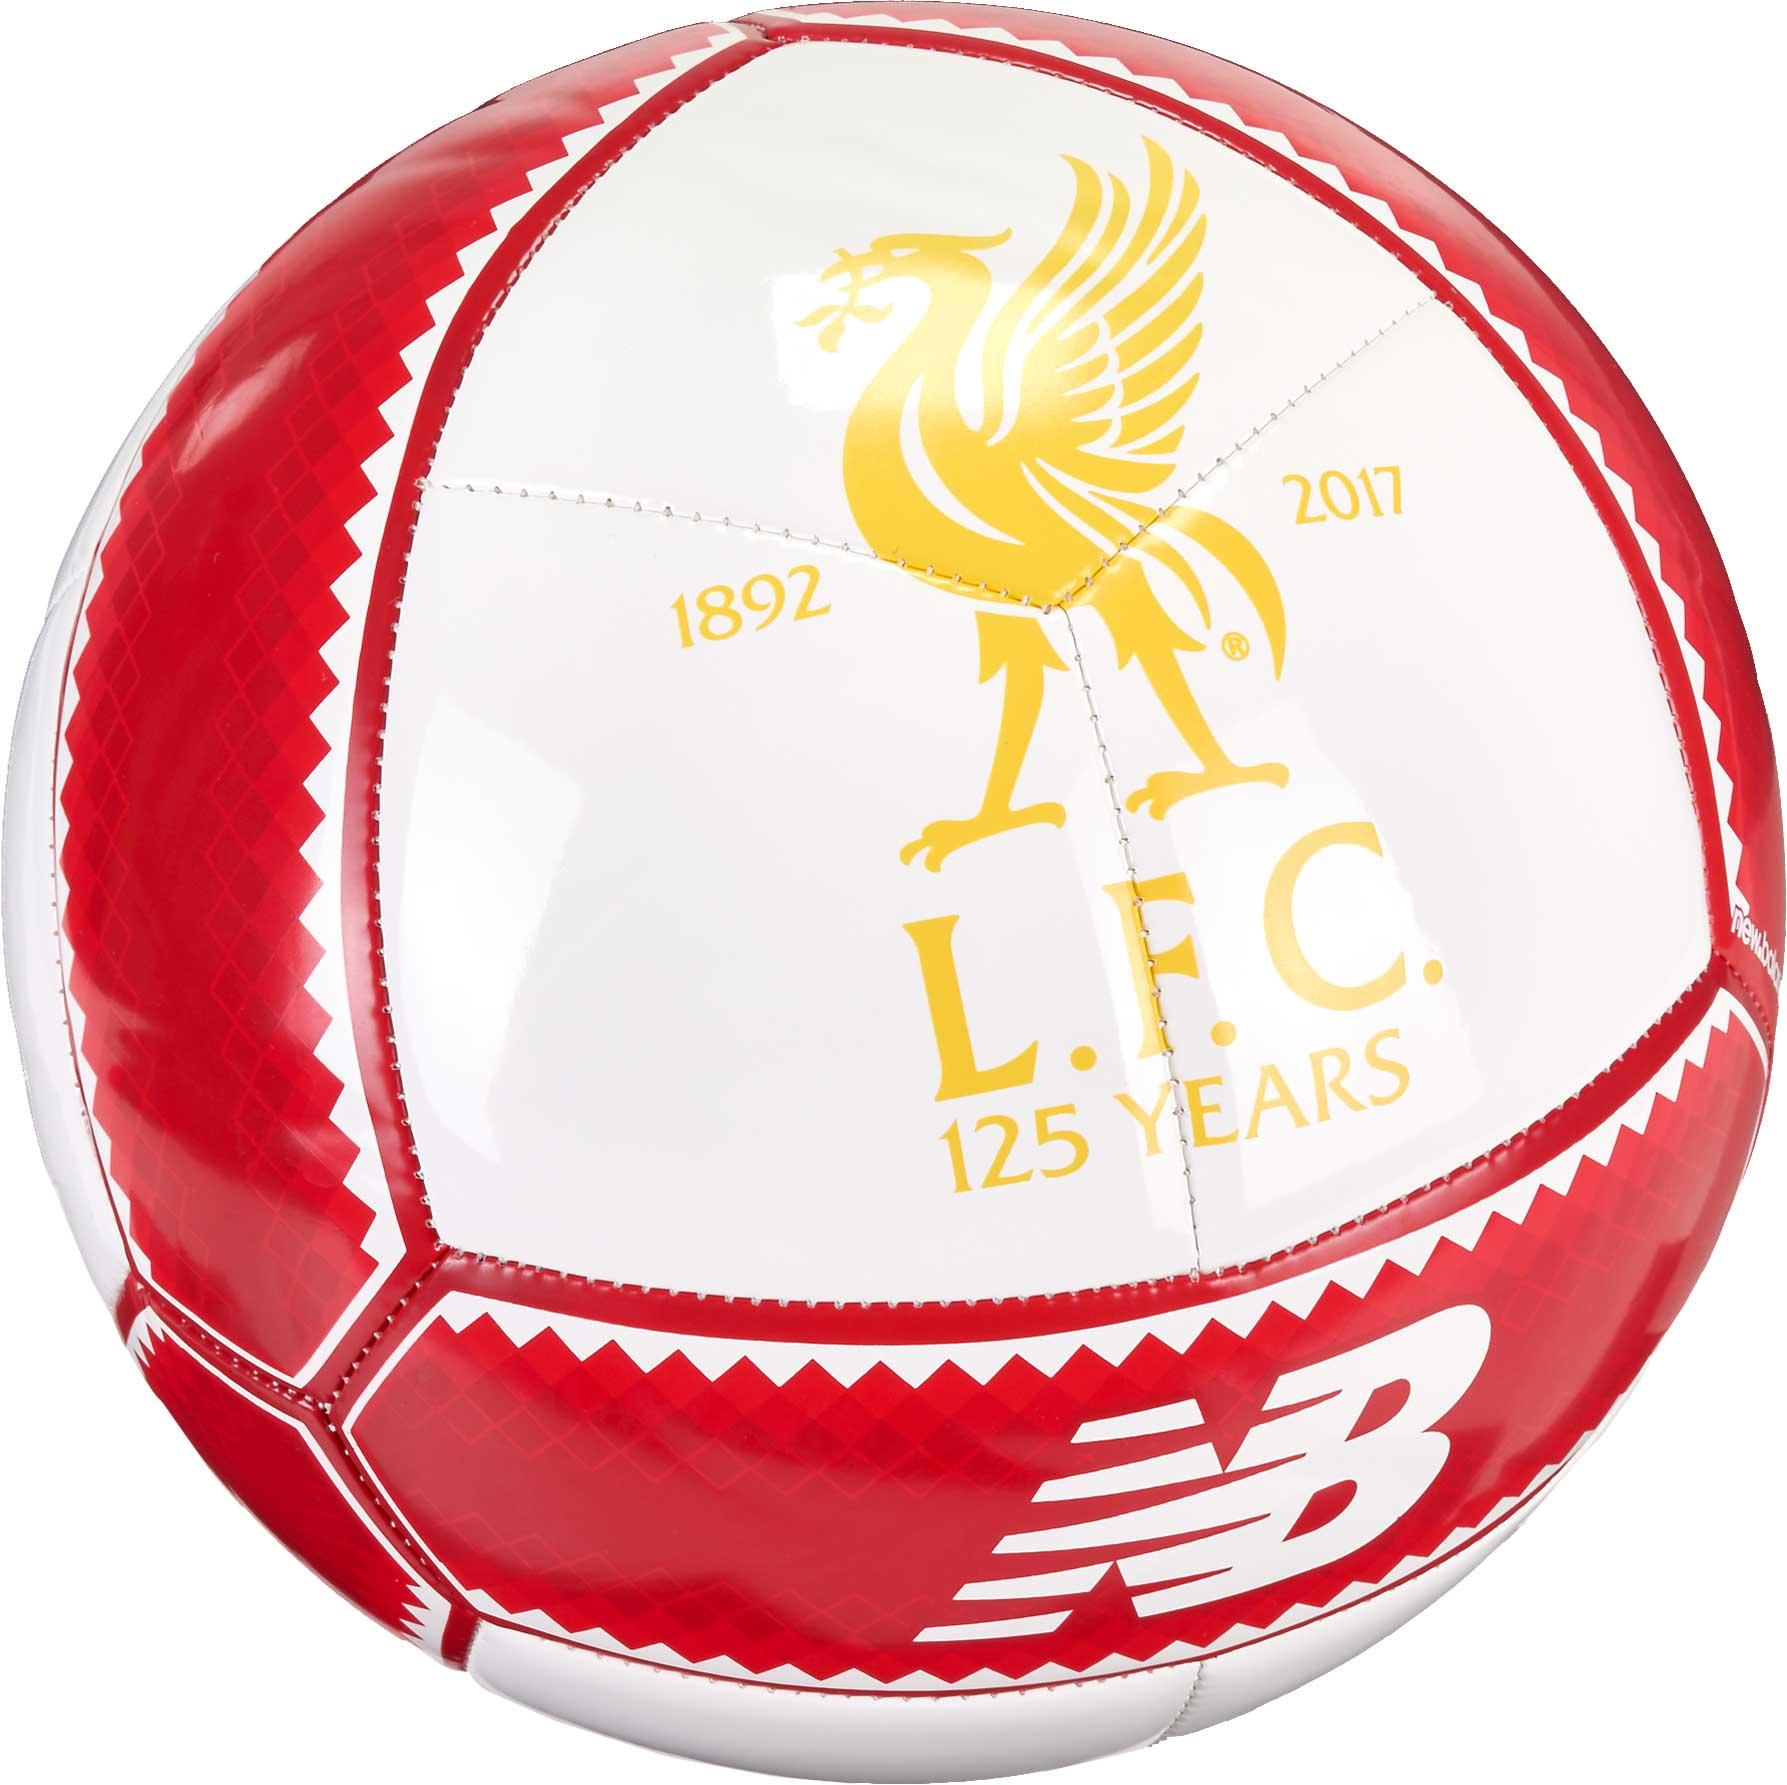 Liverpool Dispatch Ball - New Balance